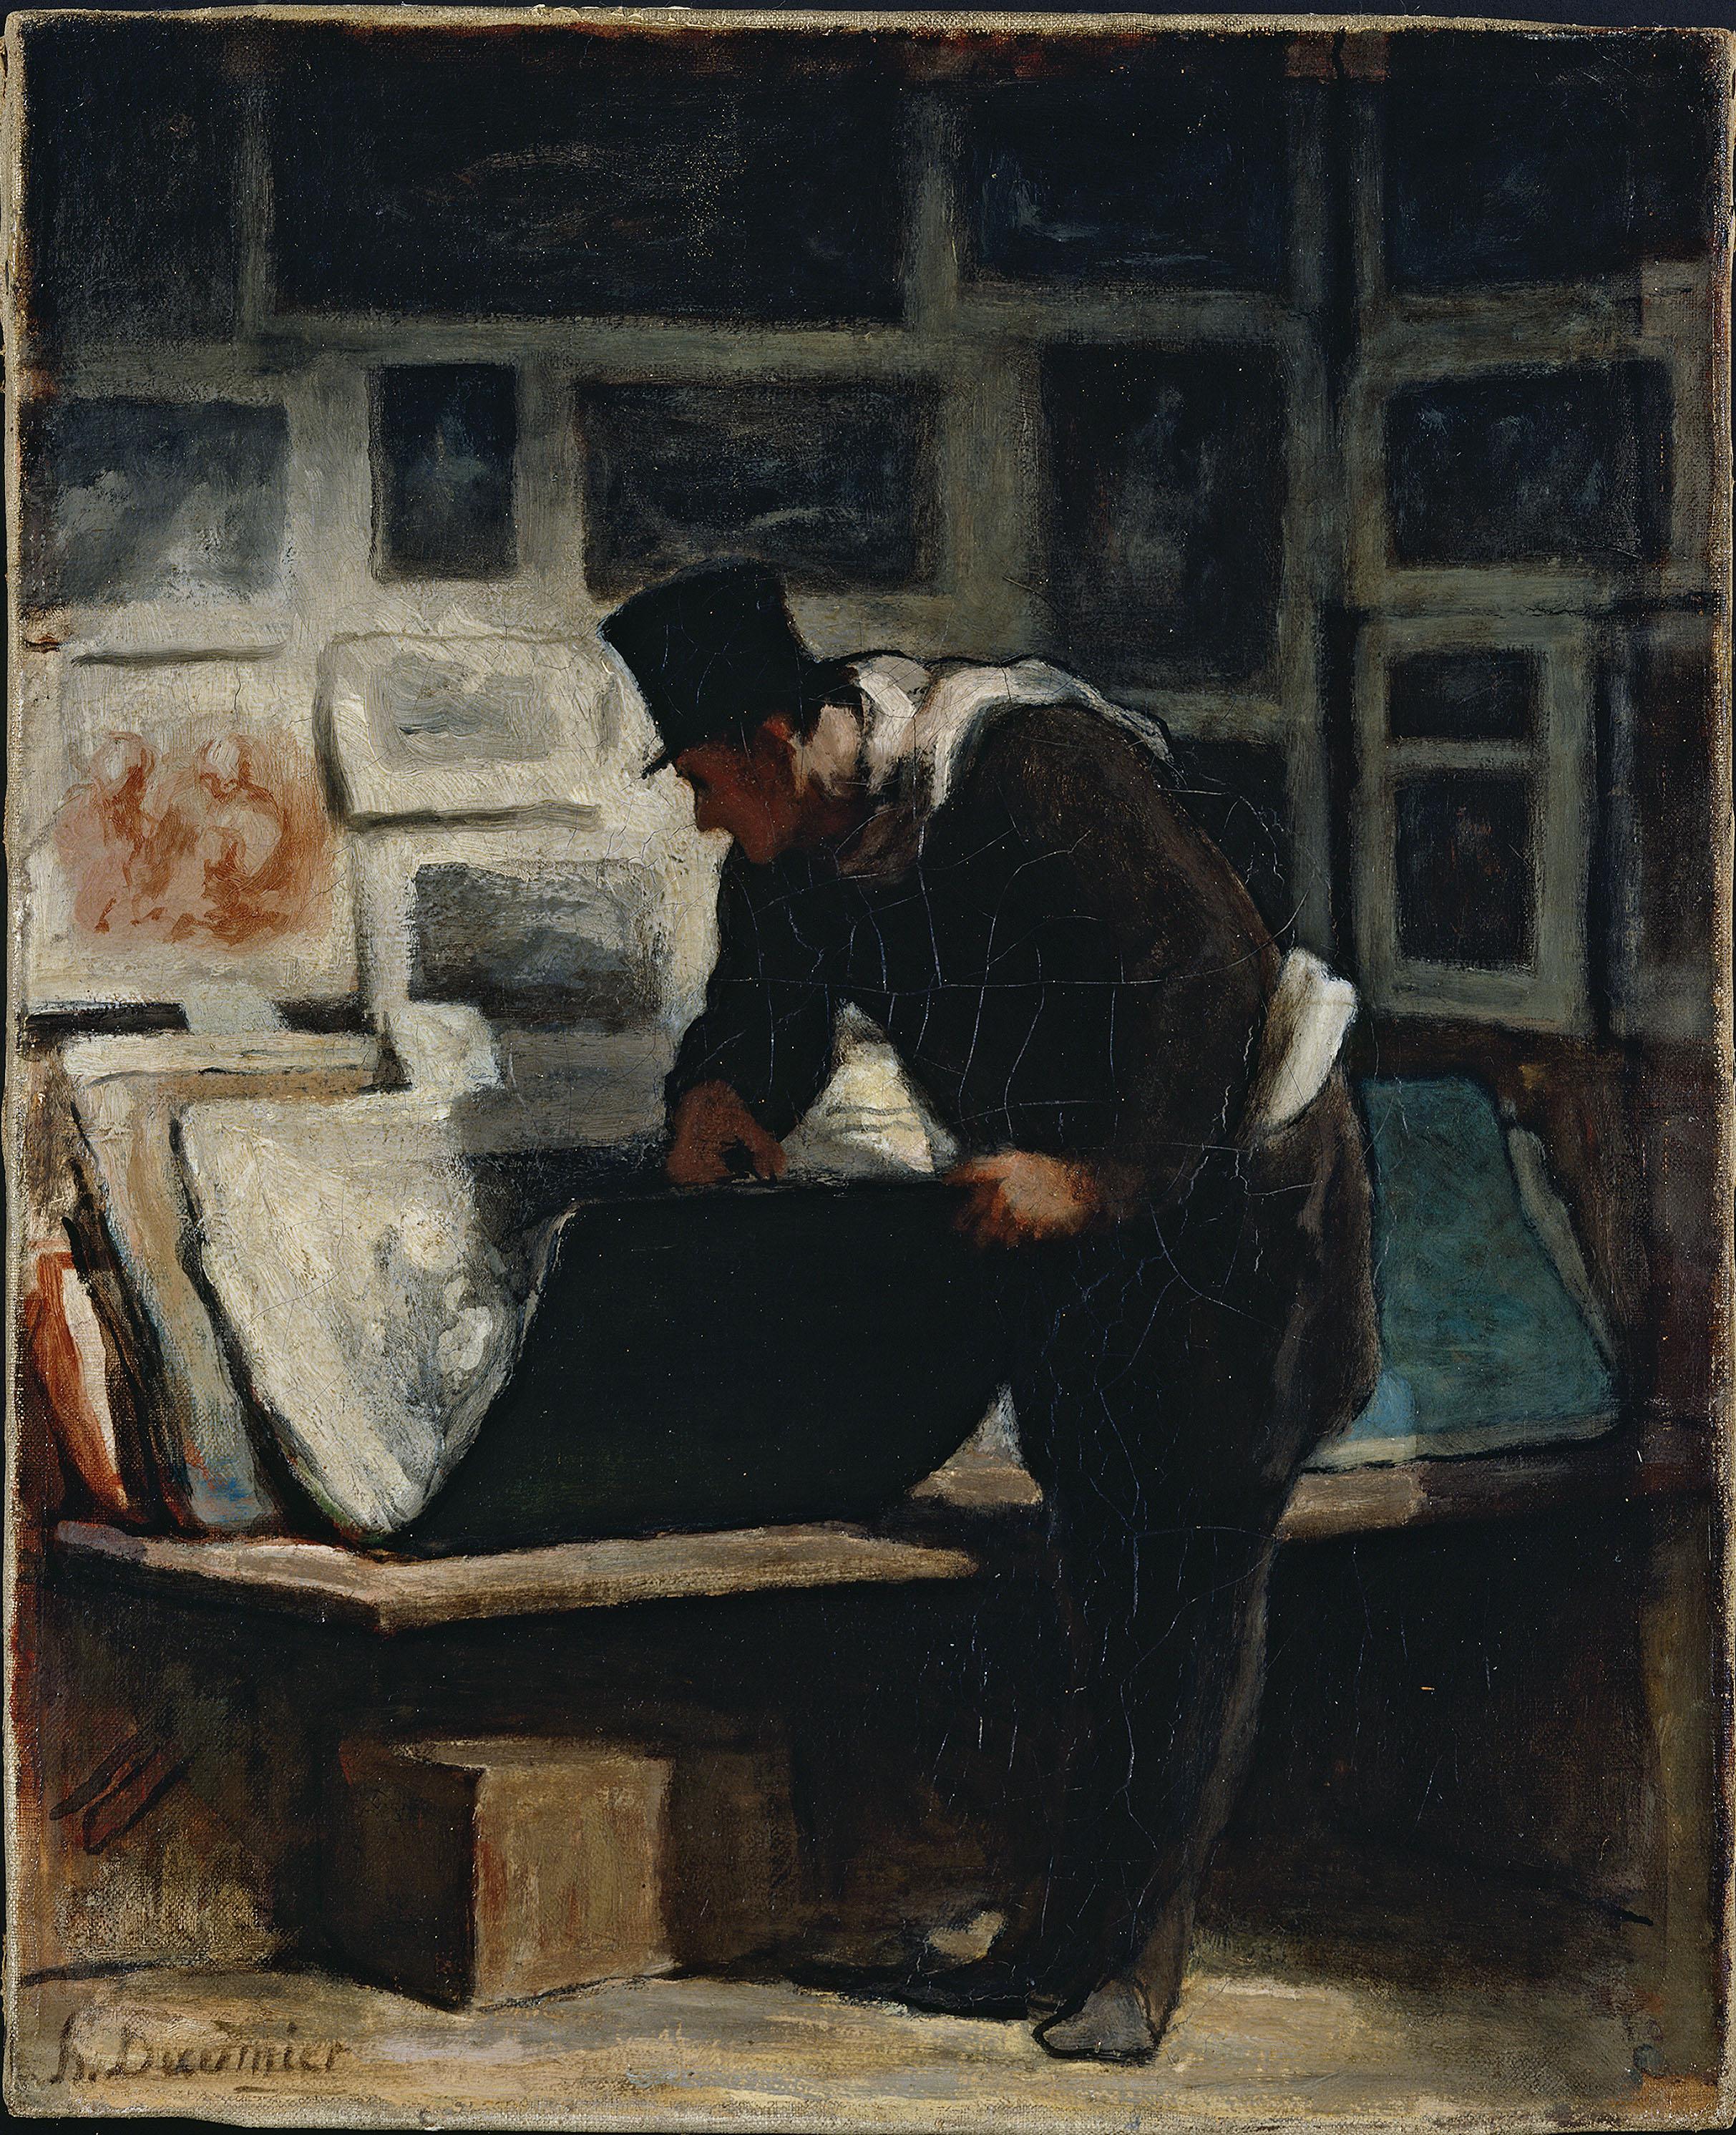 [Image: DaumierAmateurEstampe.jpg]